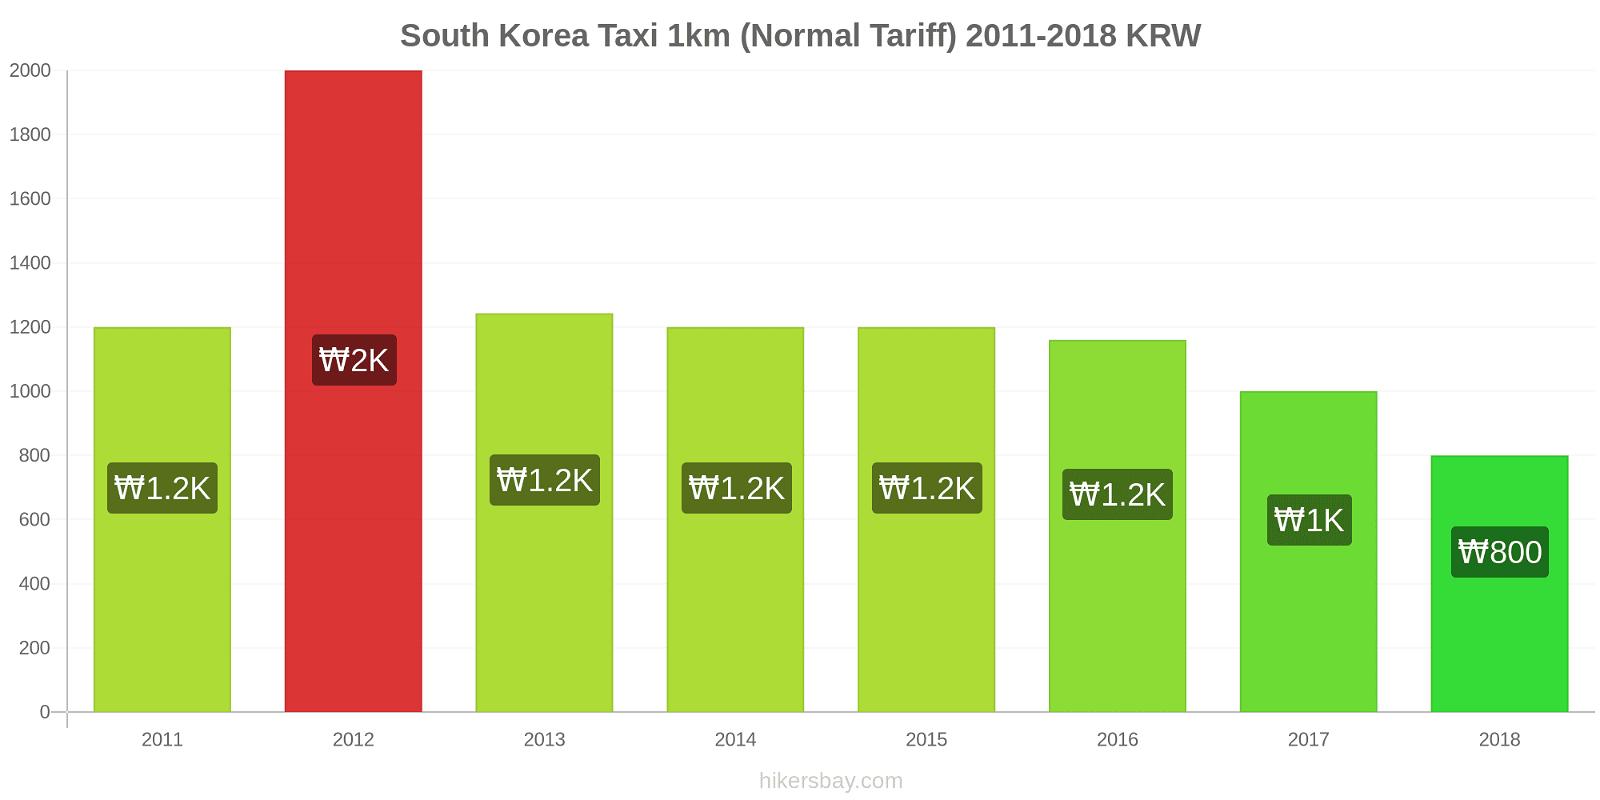 South Korea price changes Taxi 1km (Normal Tariff) hikersbay.com